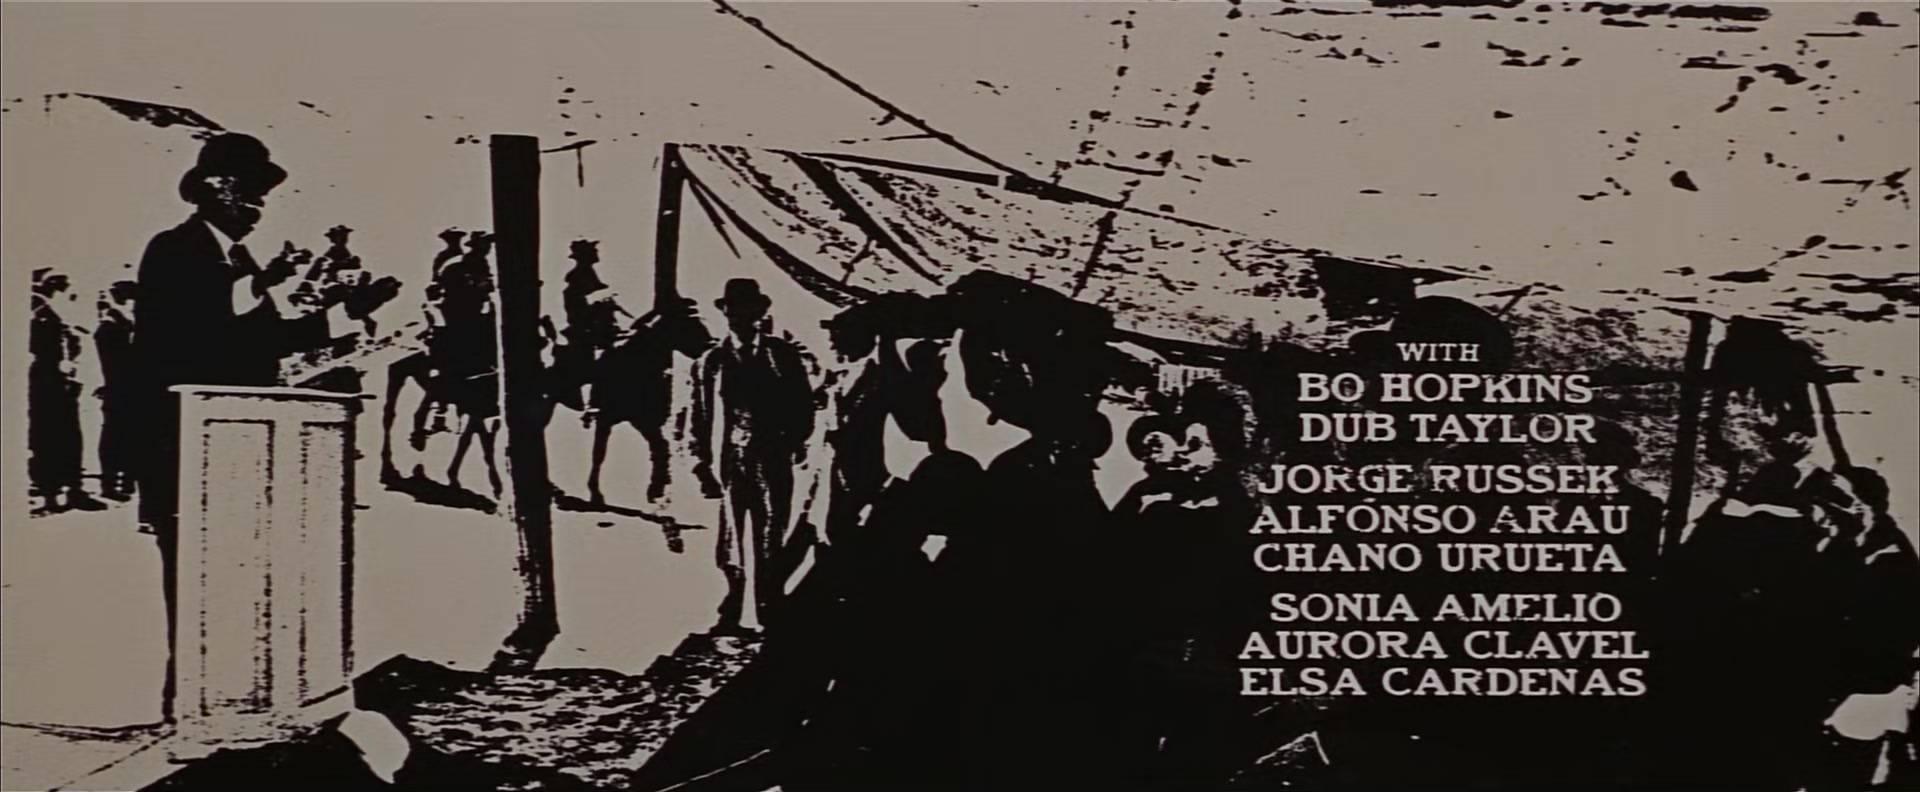 The Wild Bunch (1969)